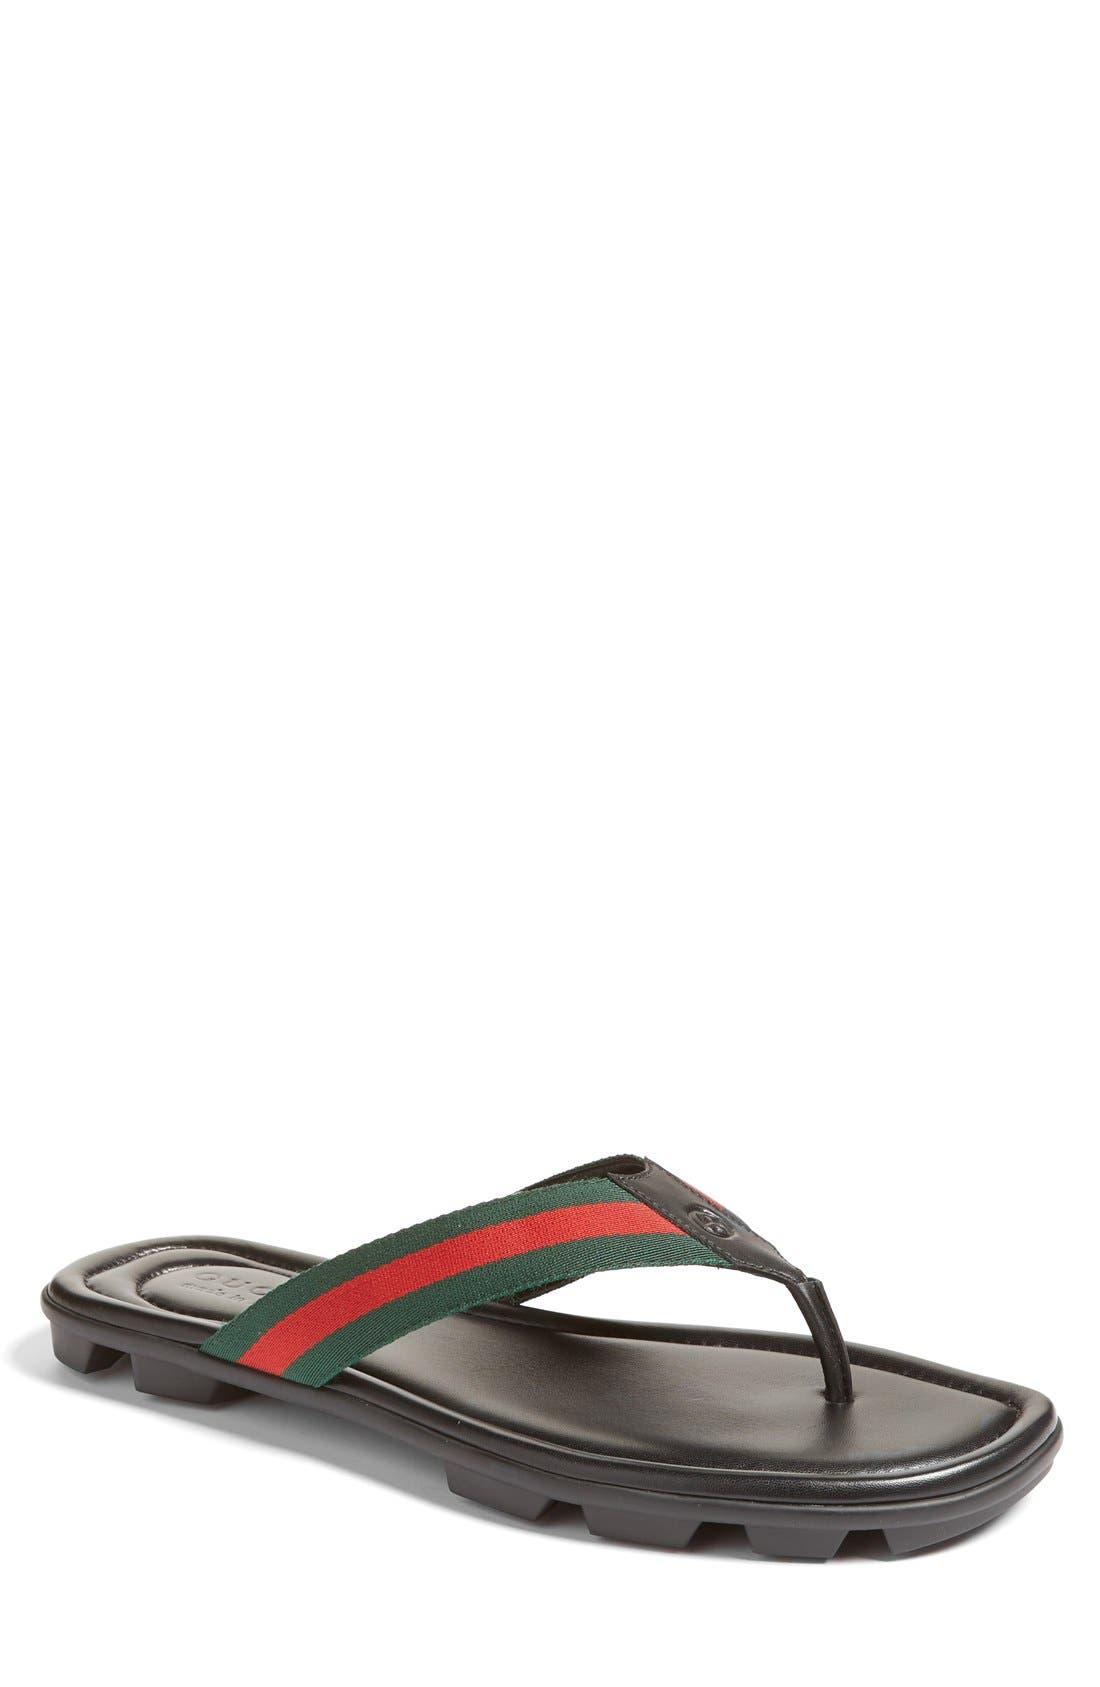 Alternate Image 1 Selected - Gucci Titan Flip Flop (Men)